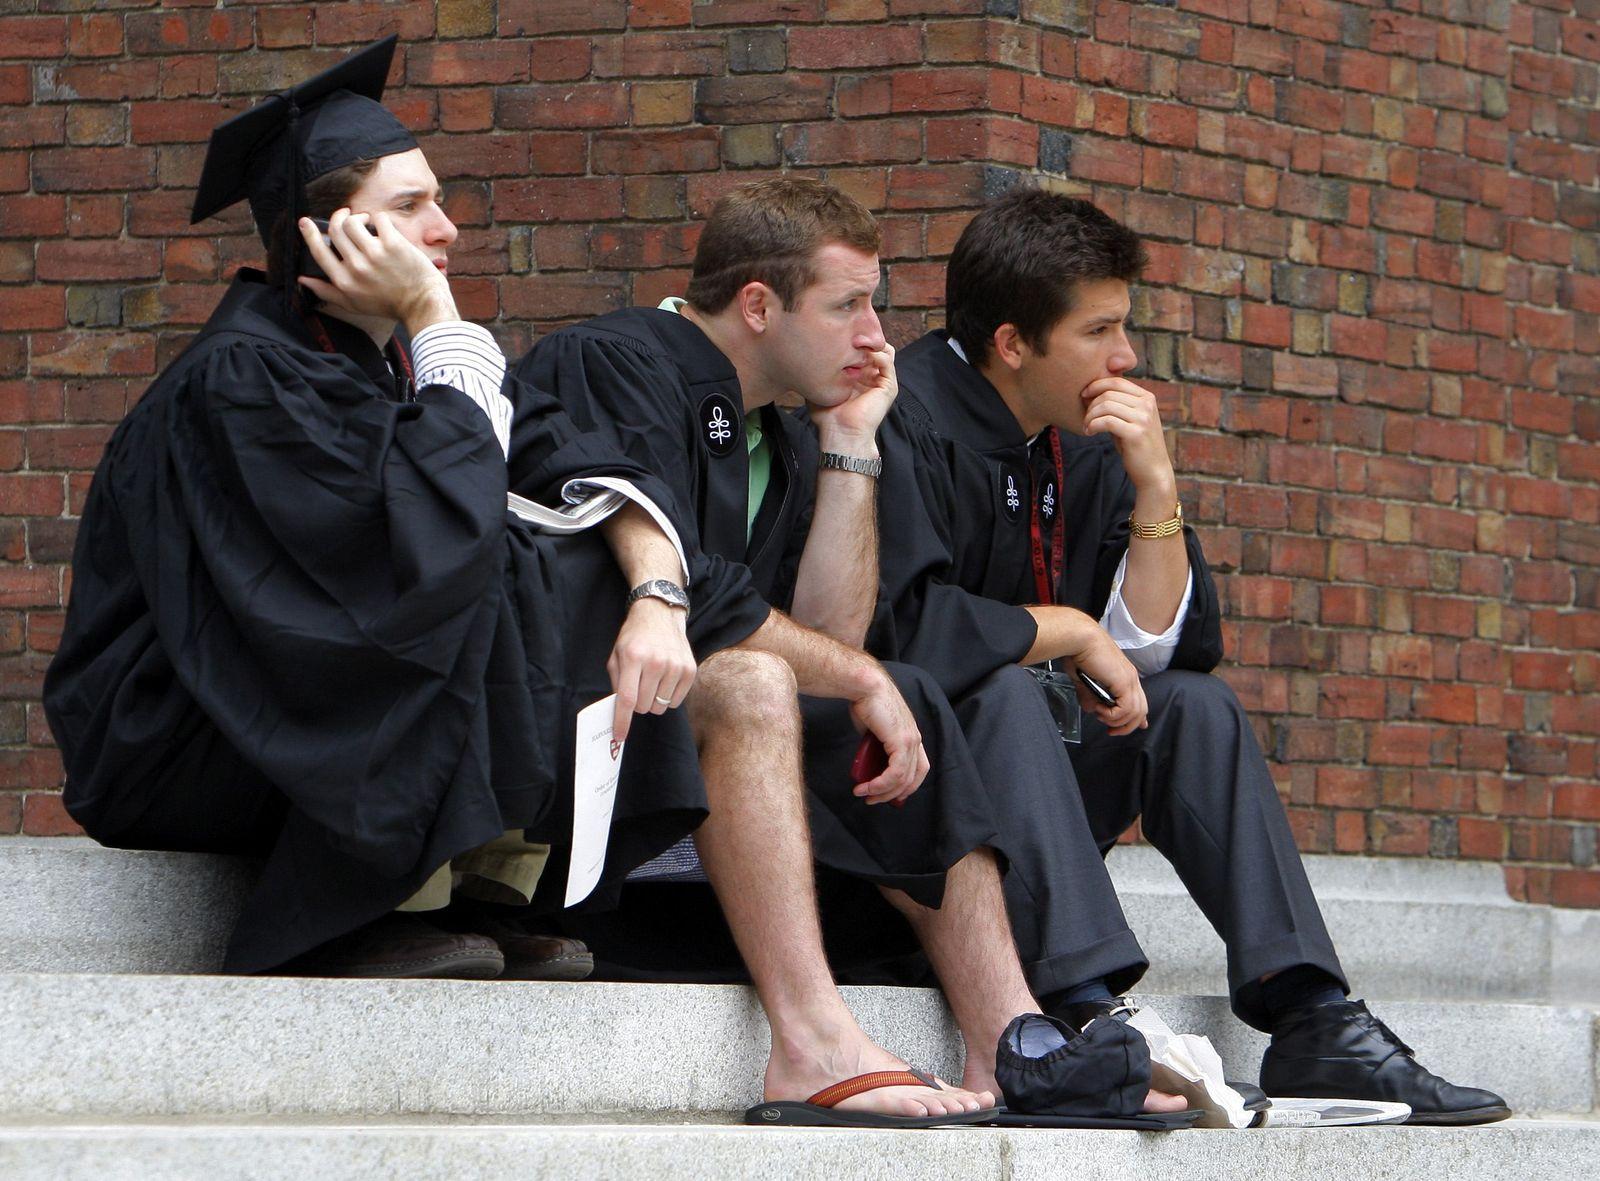 USA-ECONOMY/STUDENTS